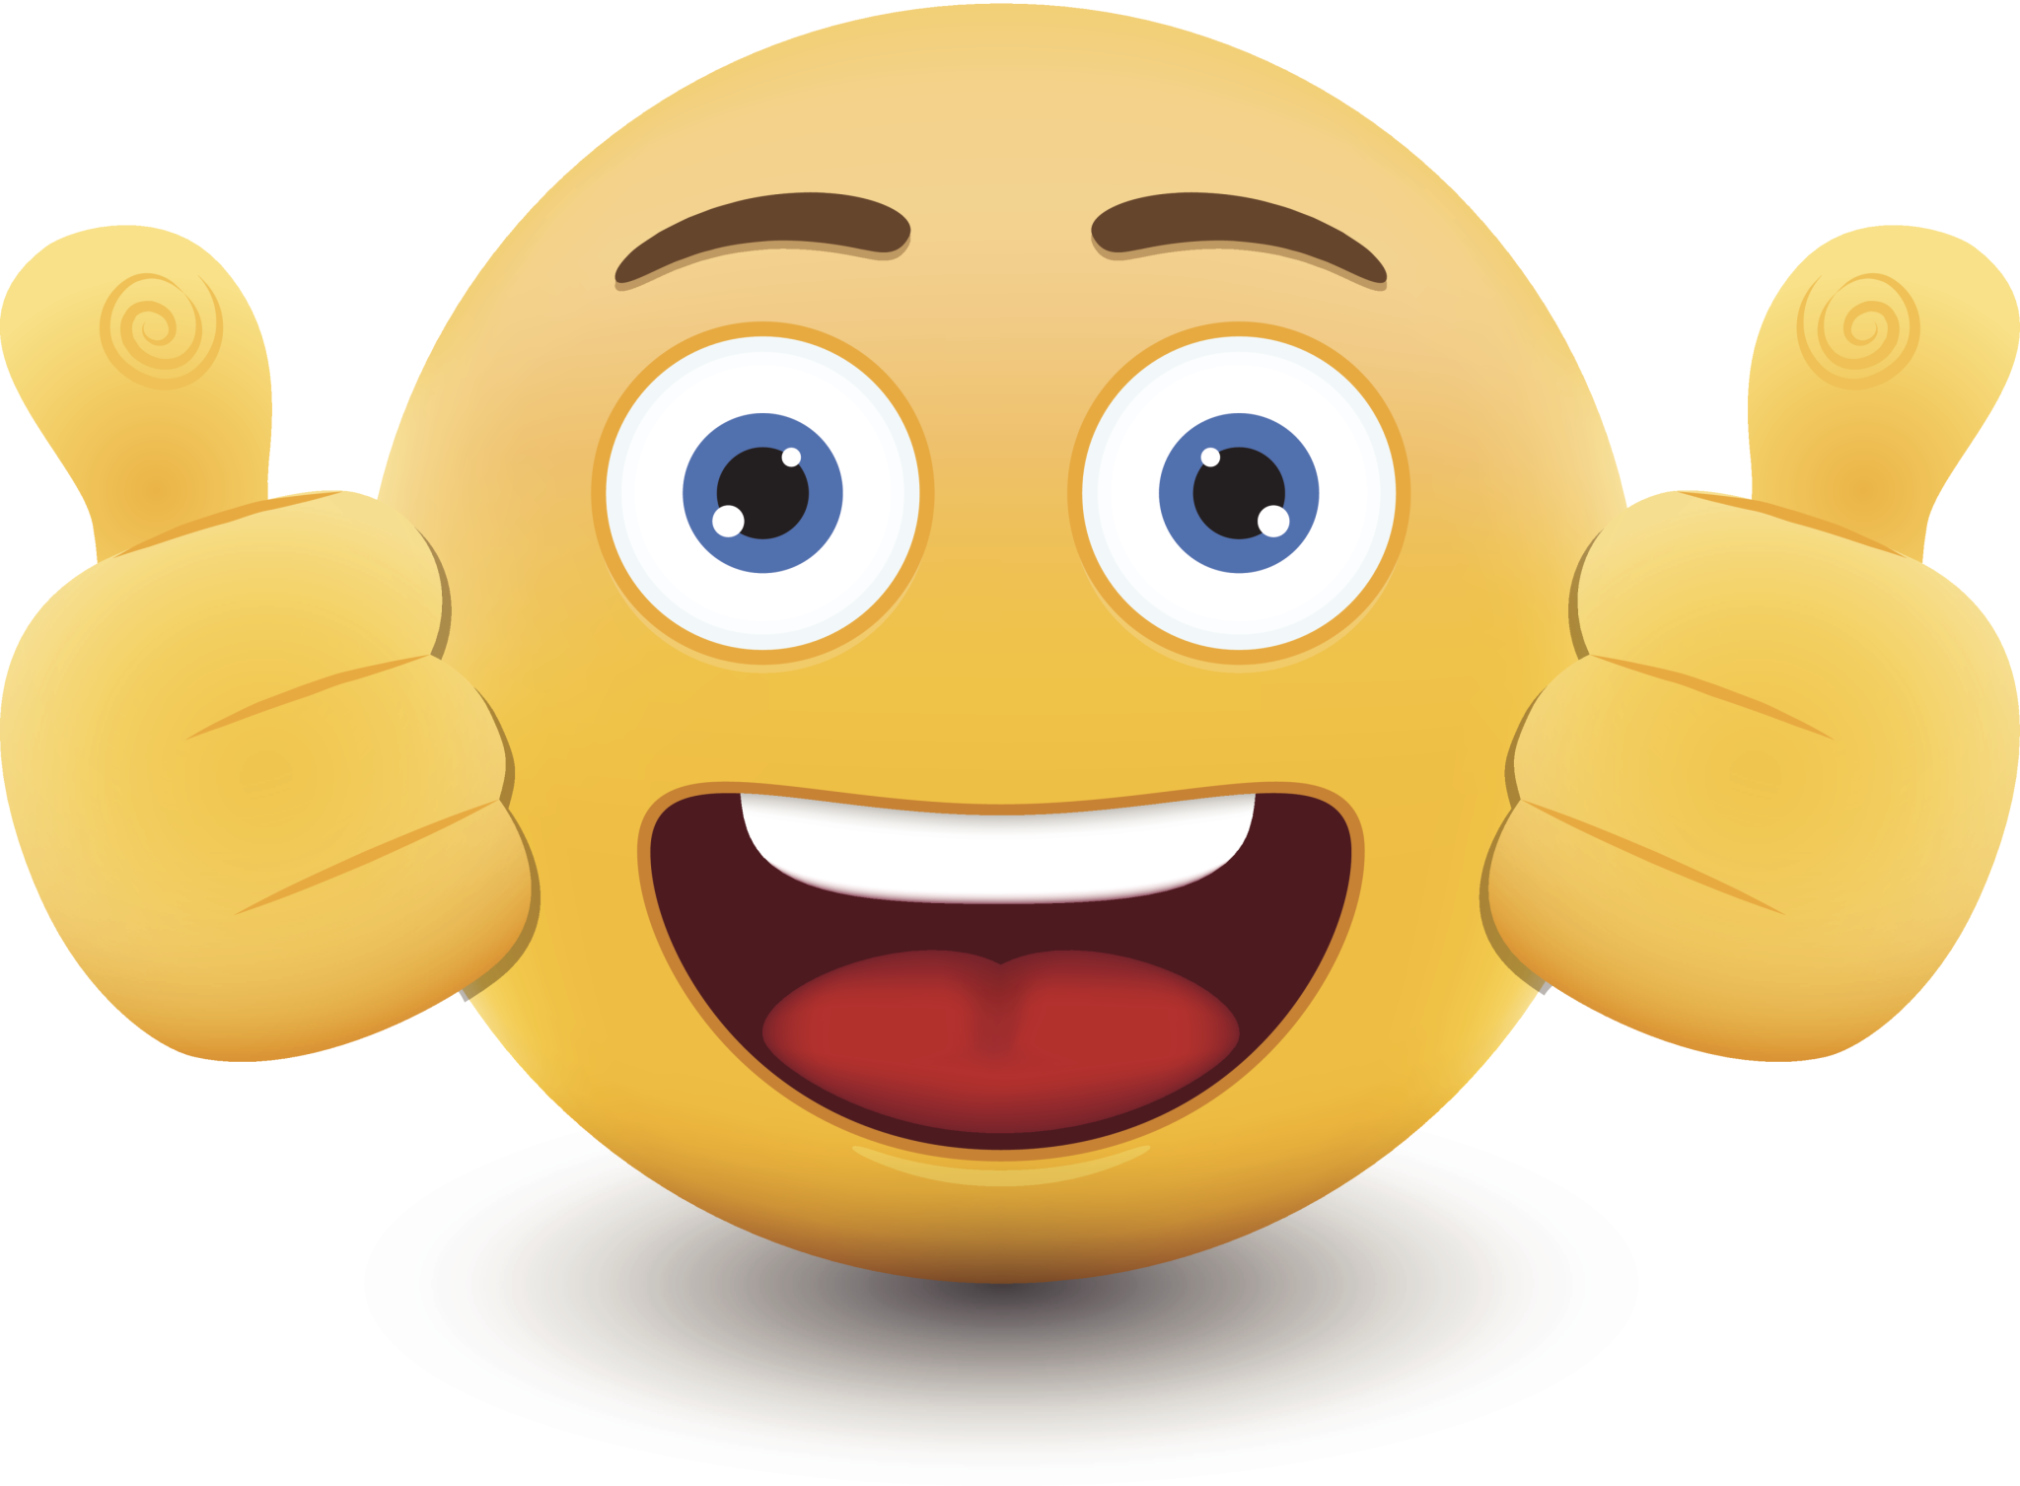 emoji-happy-thumbs-up.jpg